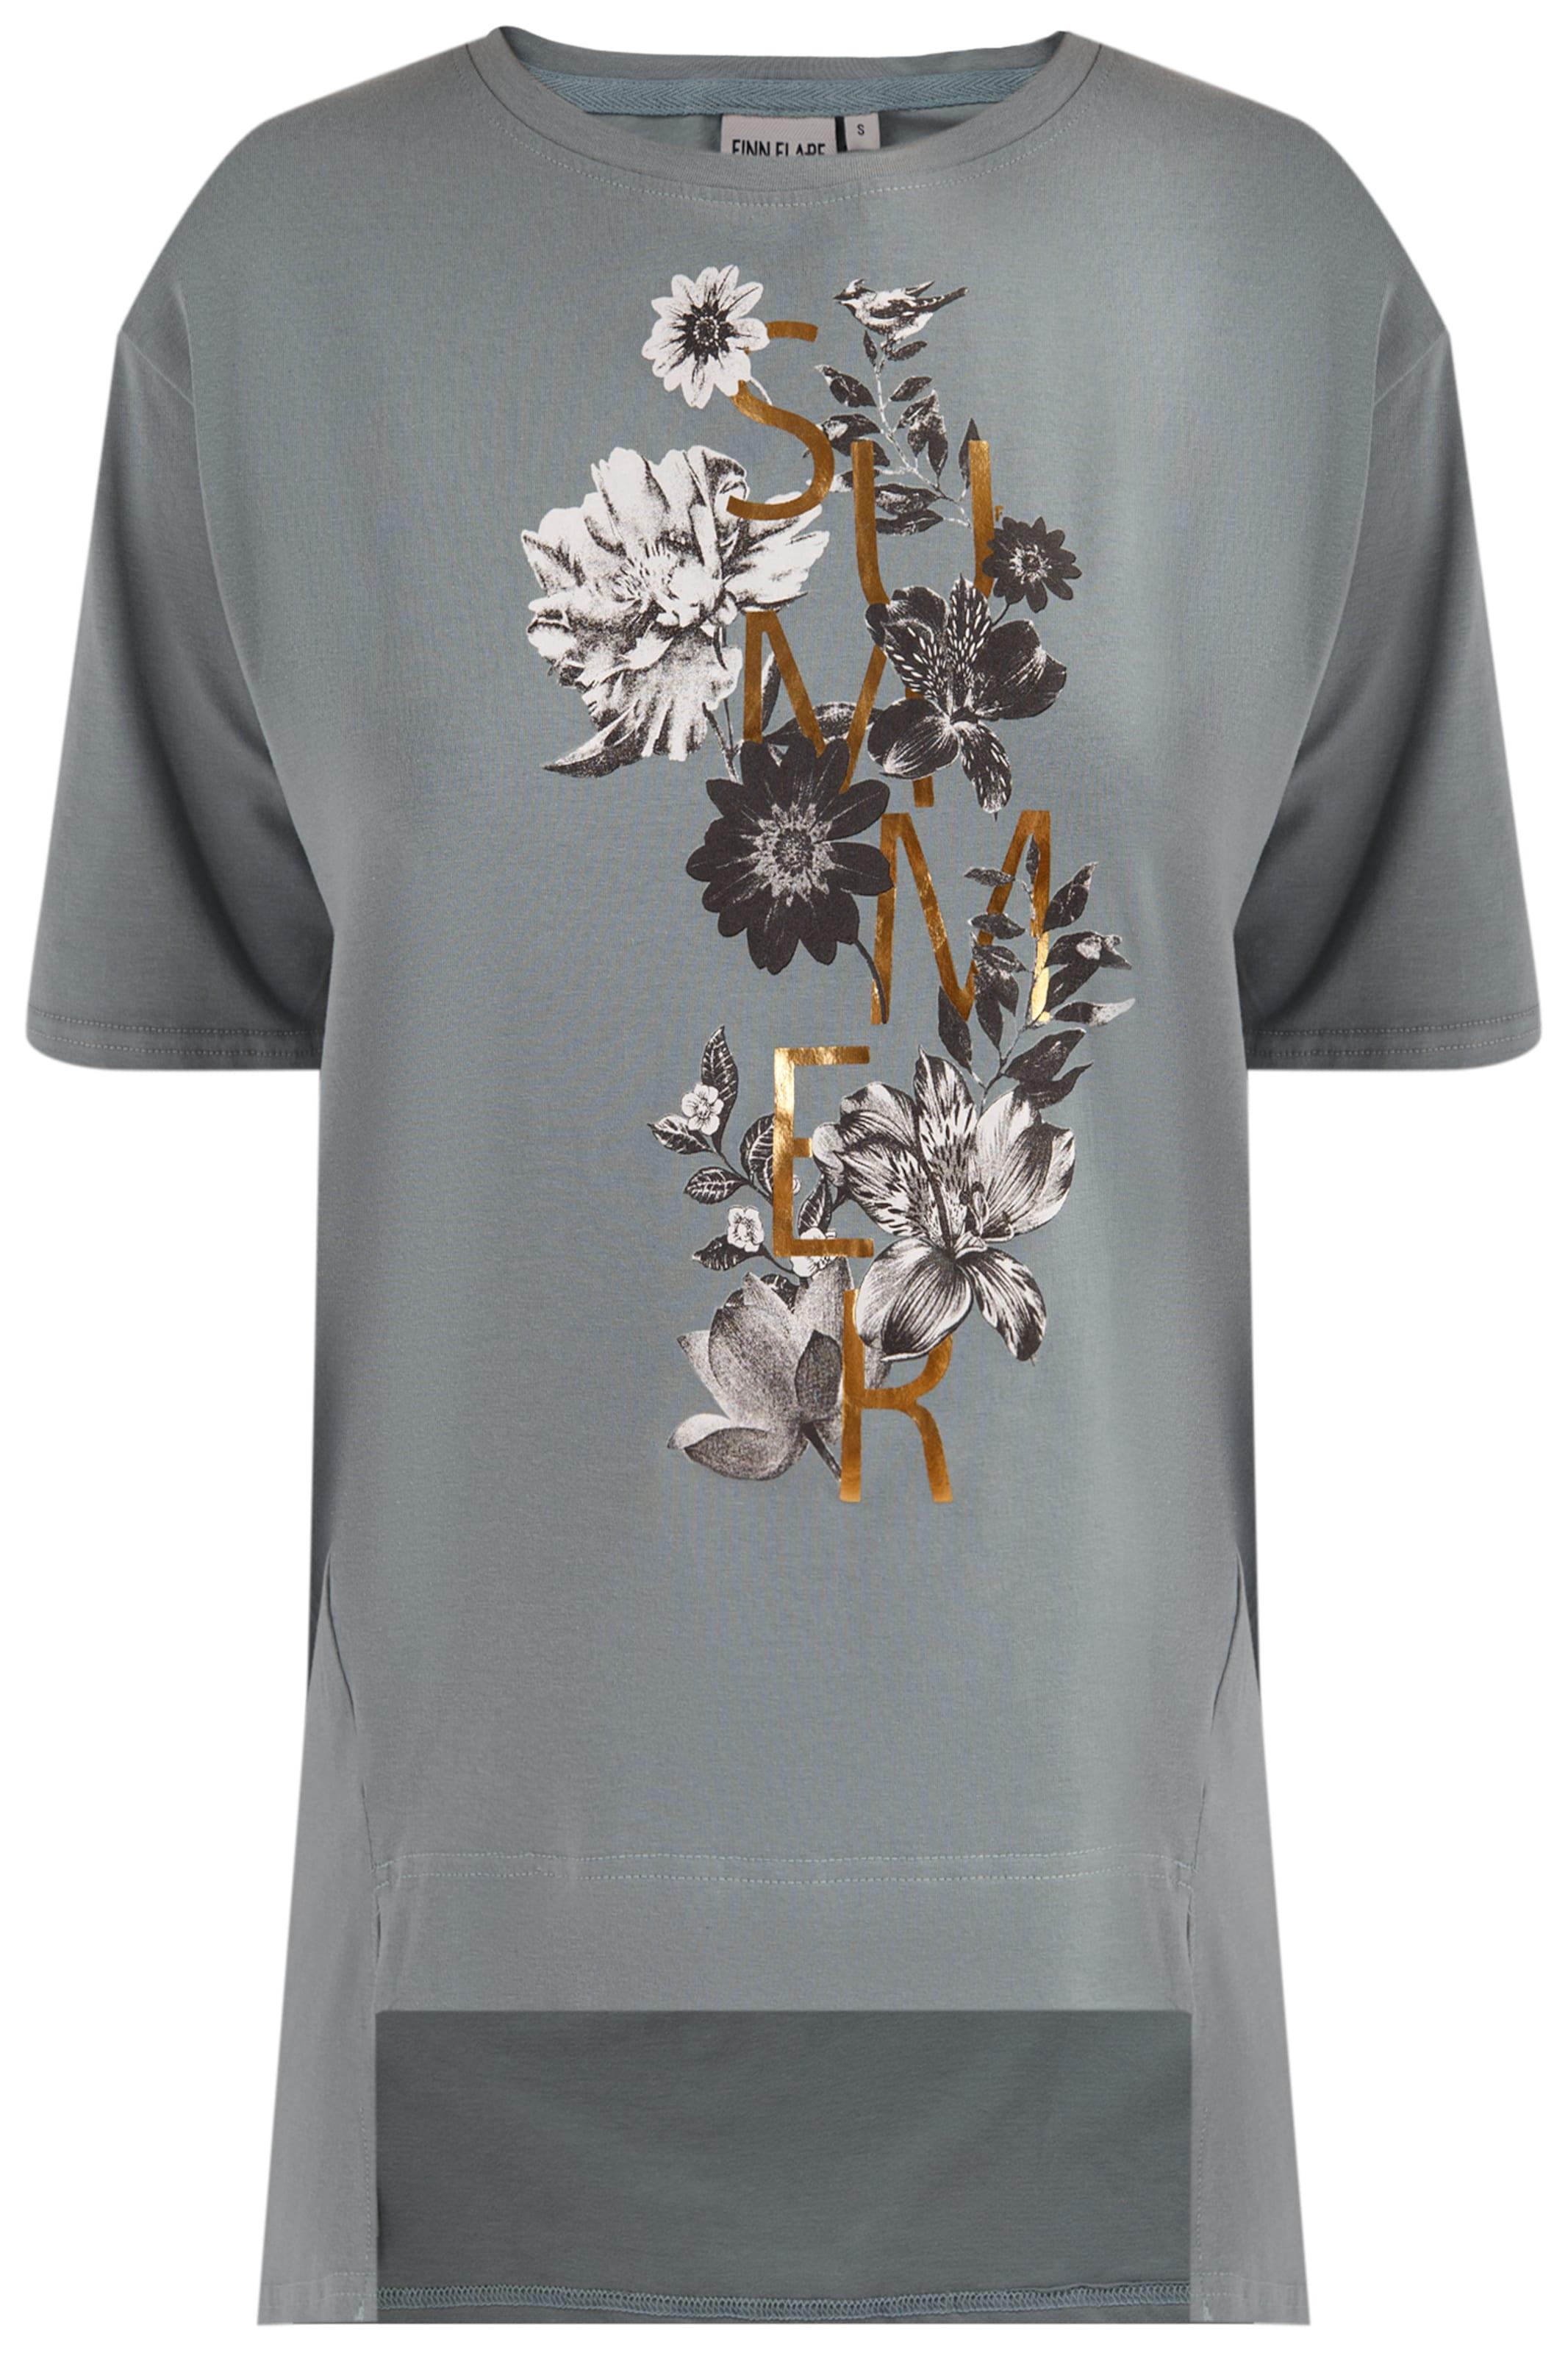 In Finn Weiß GoldDunkelgrau T Schwarz Flare shirt OPkZXiu